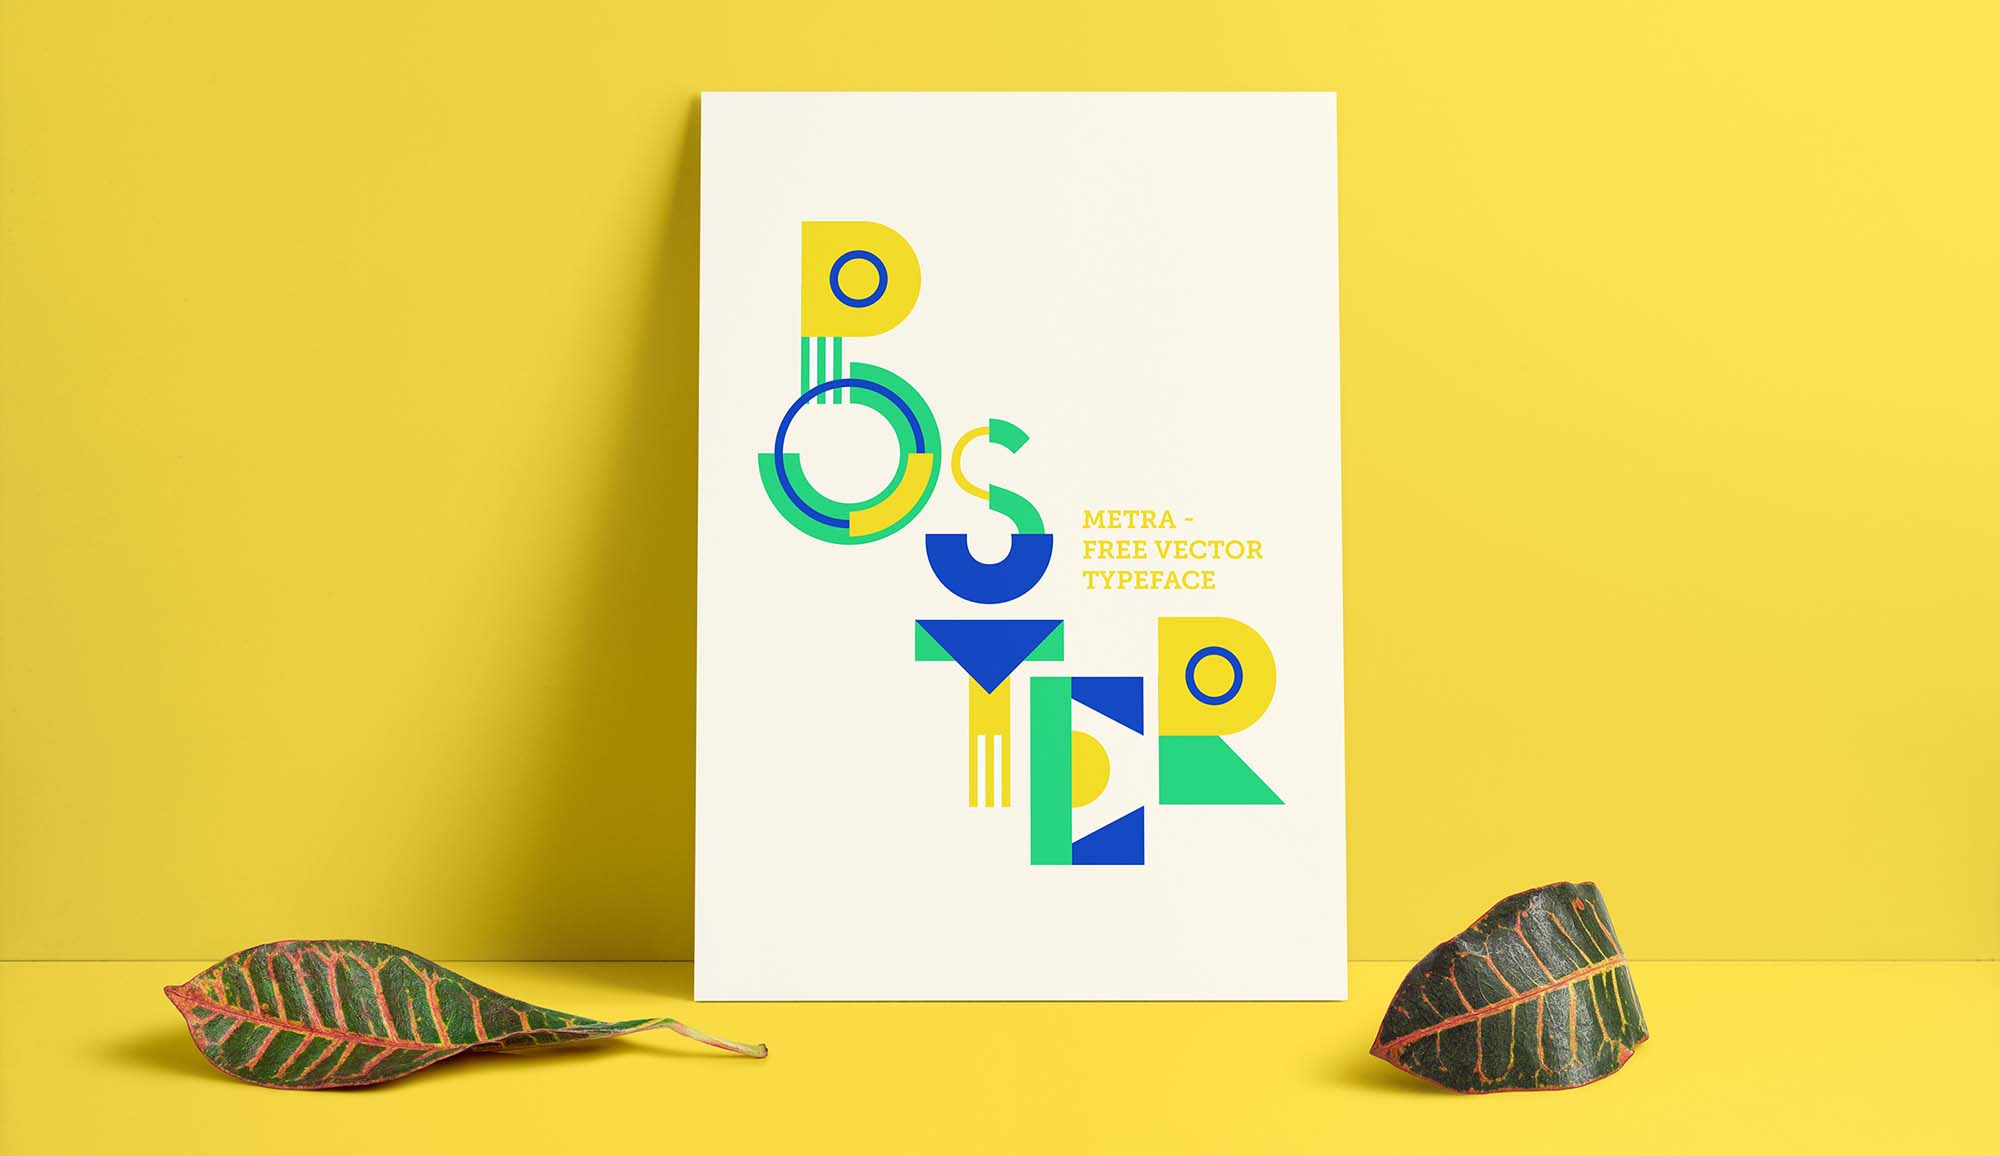 Metra Vector Typeface Poster